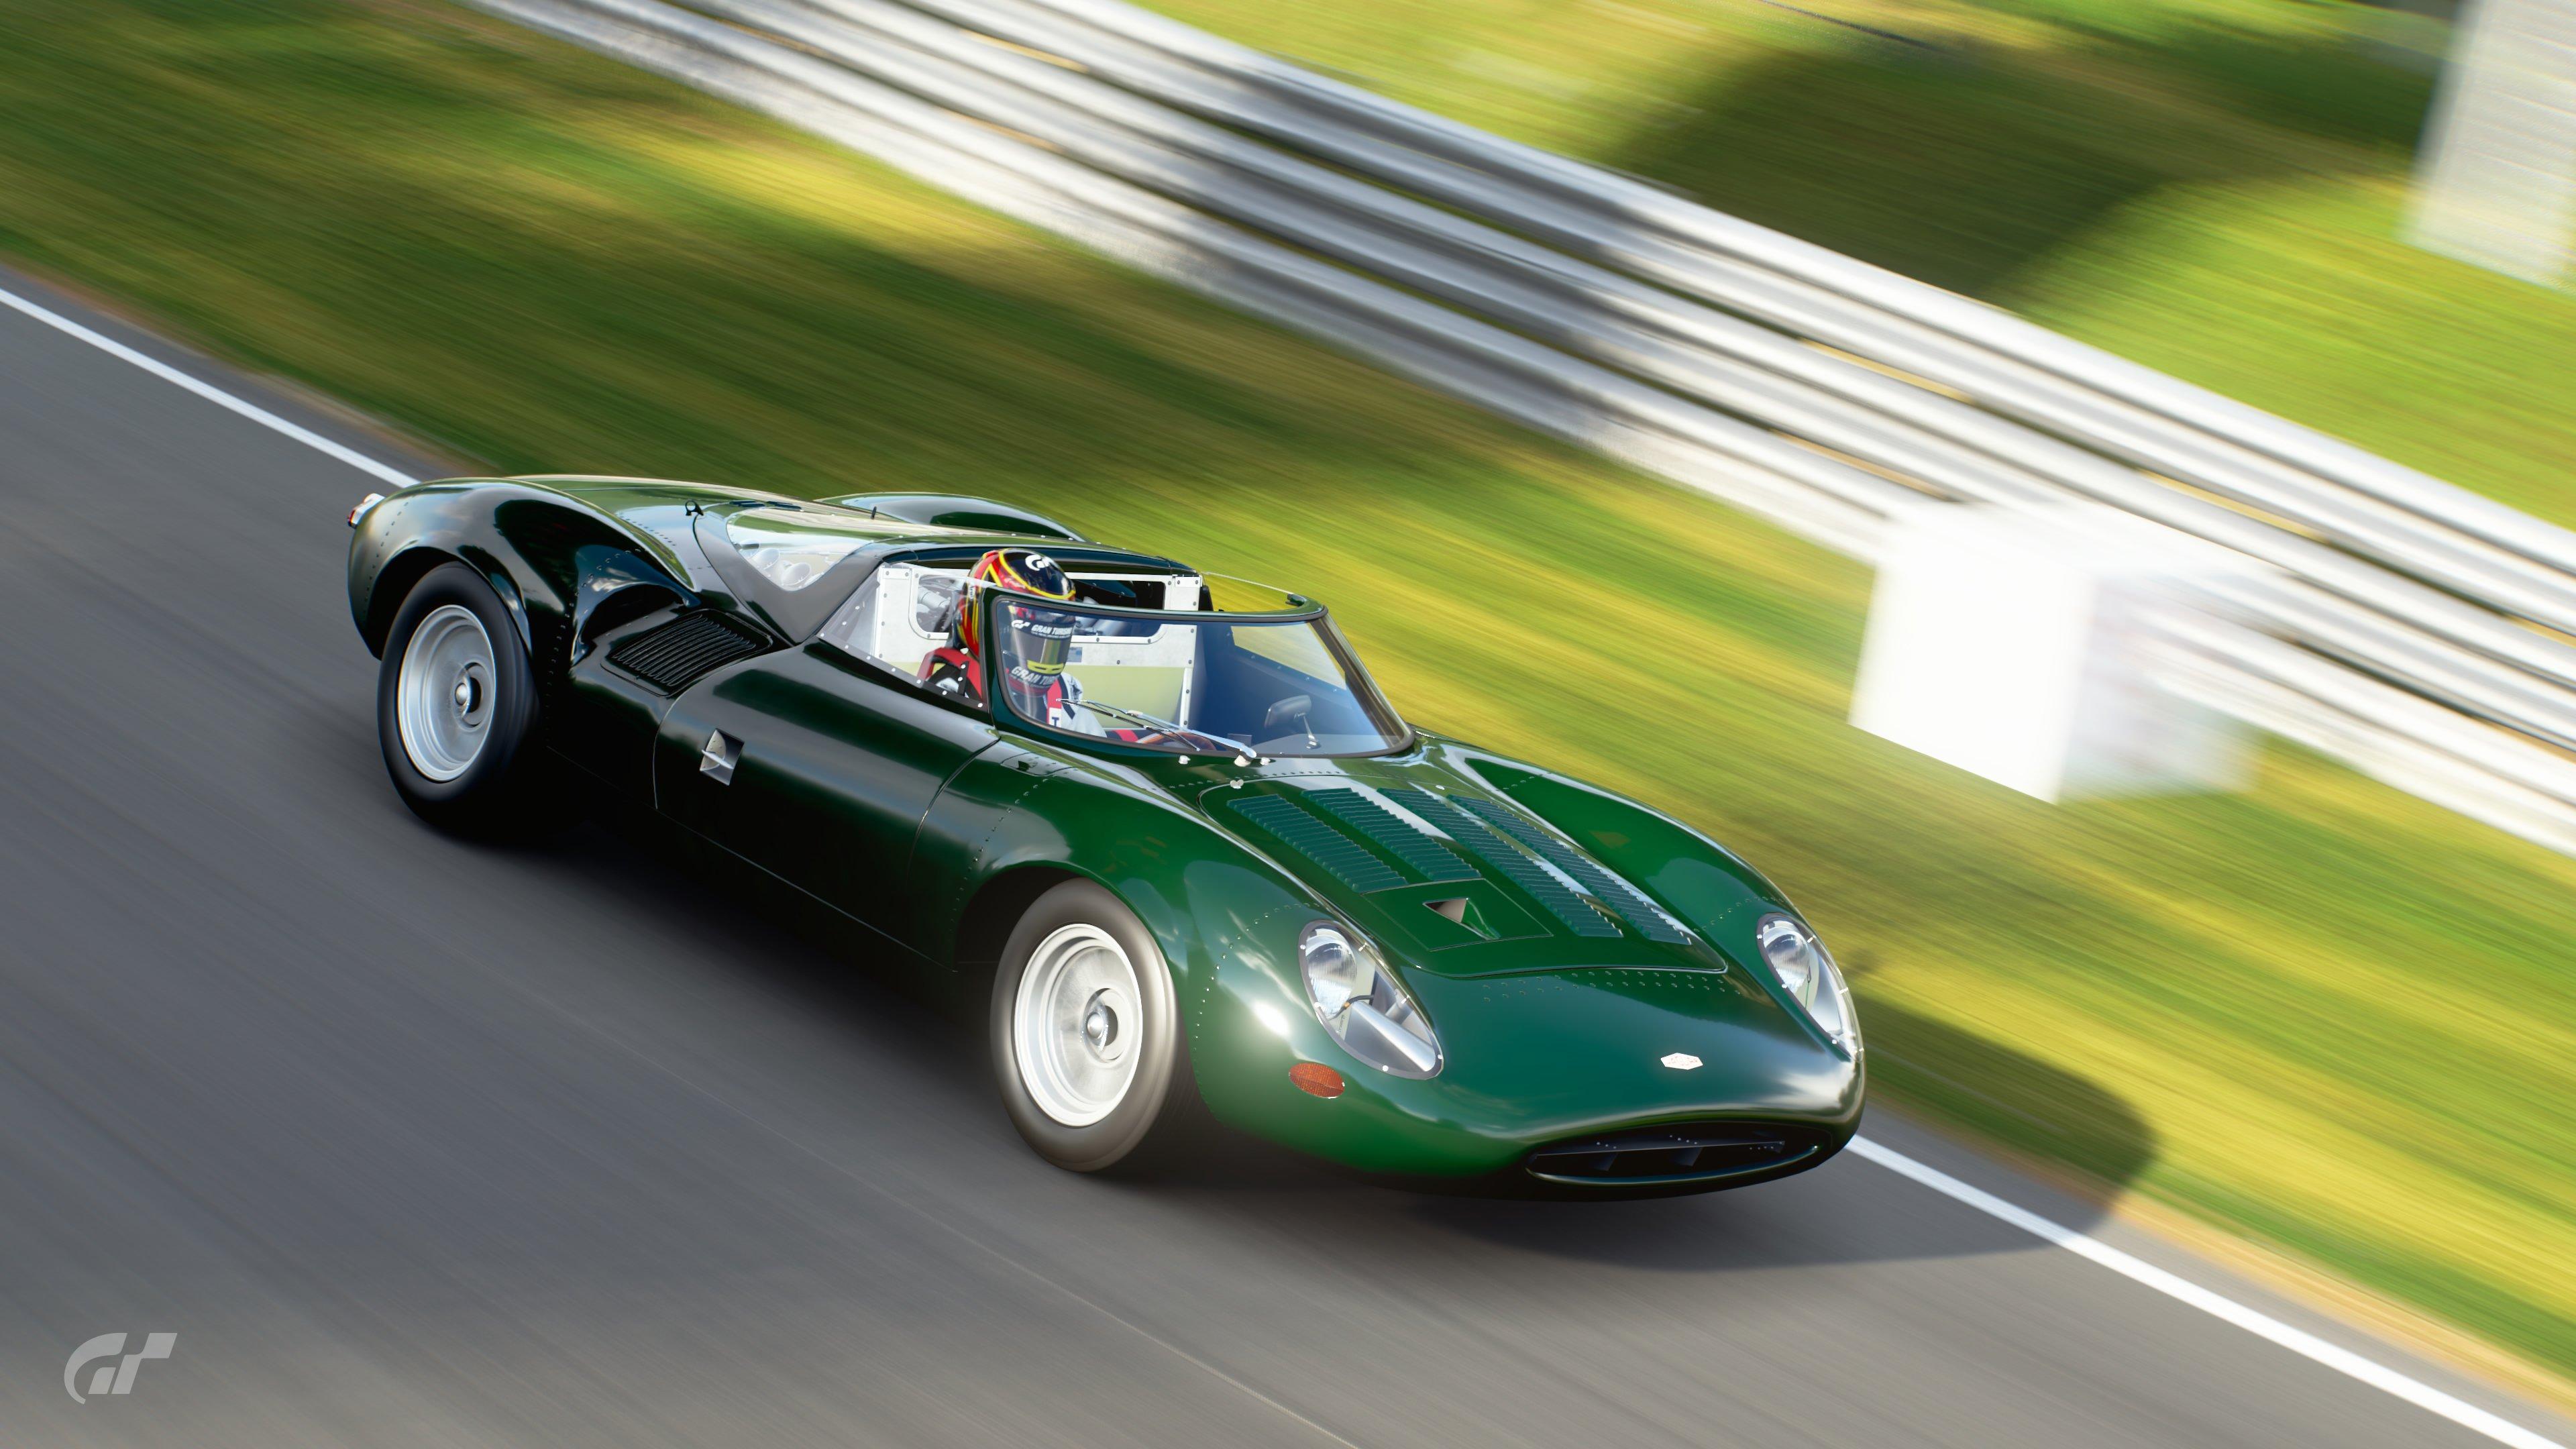 Gran Turismo Sport Update Arrives September 28 – GTPlanet - GTPlanet